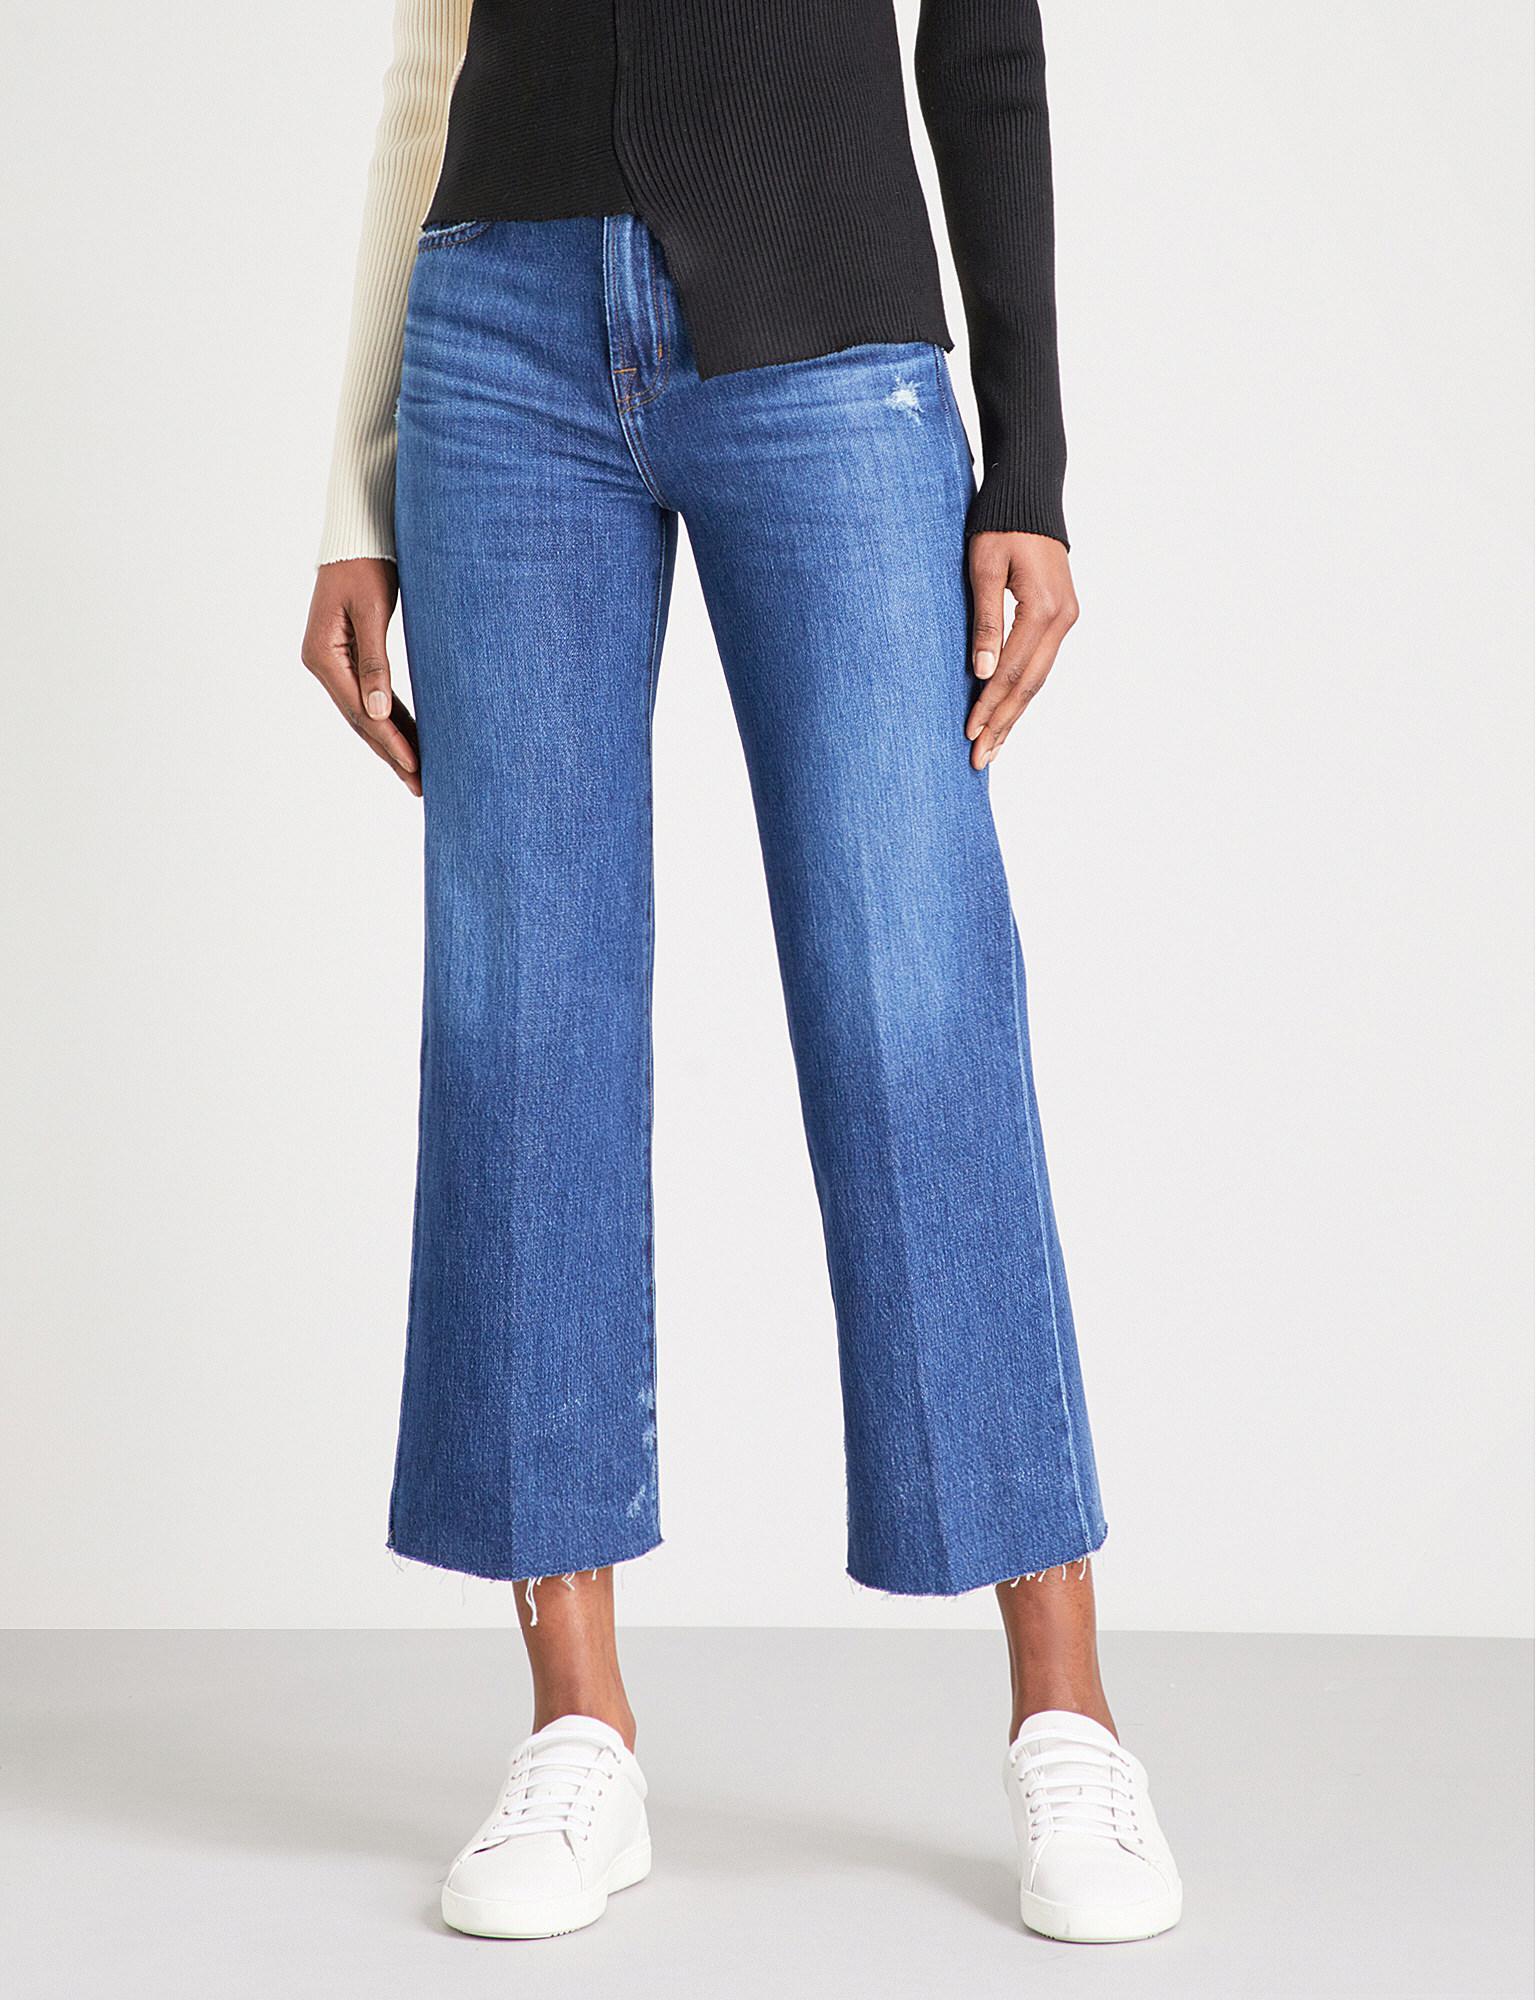 Joan High Rise Wide Leg Crop Jeans - Double take blue J Brand apHBD6wCa